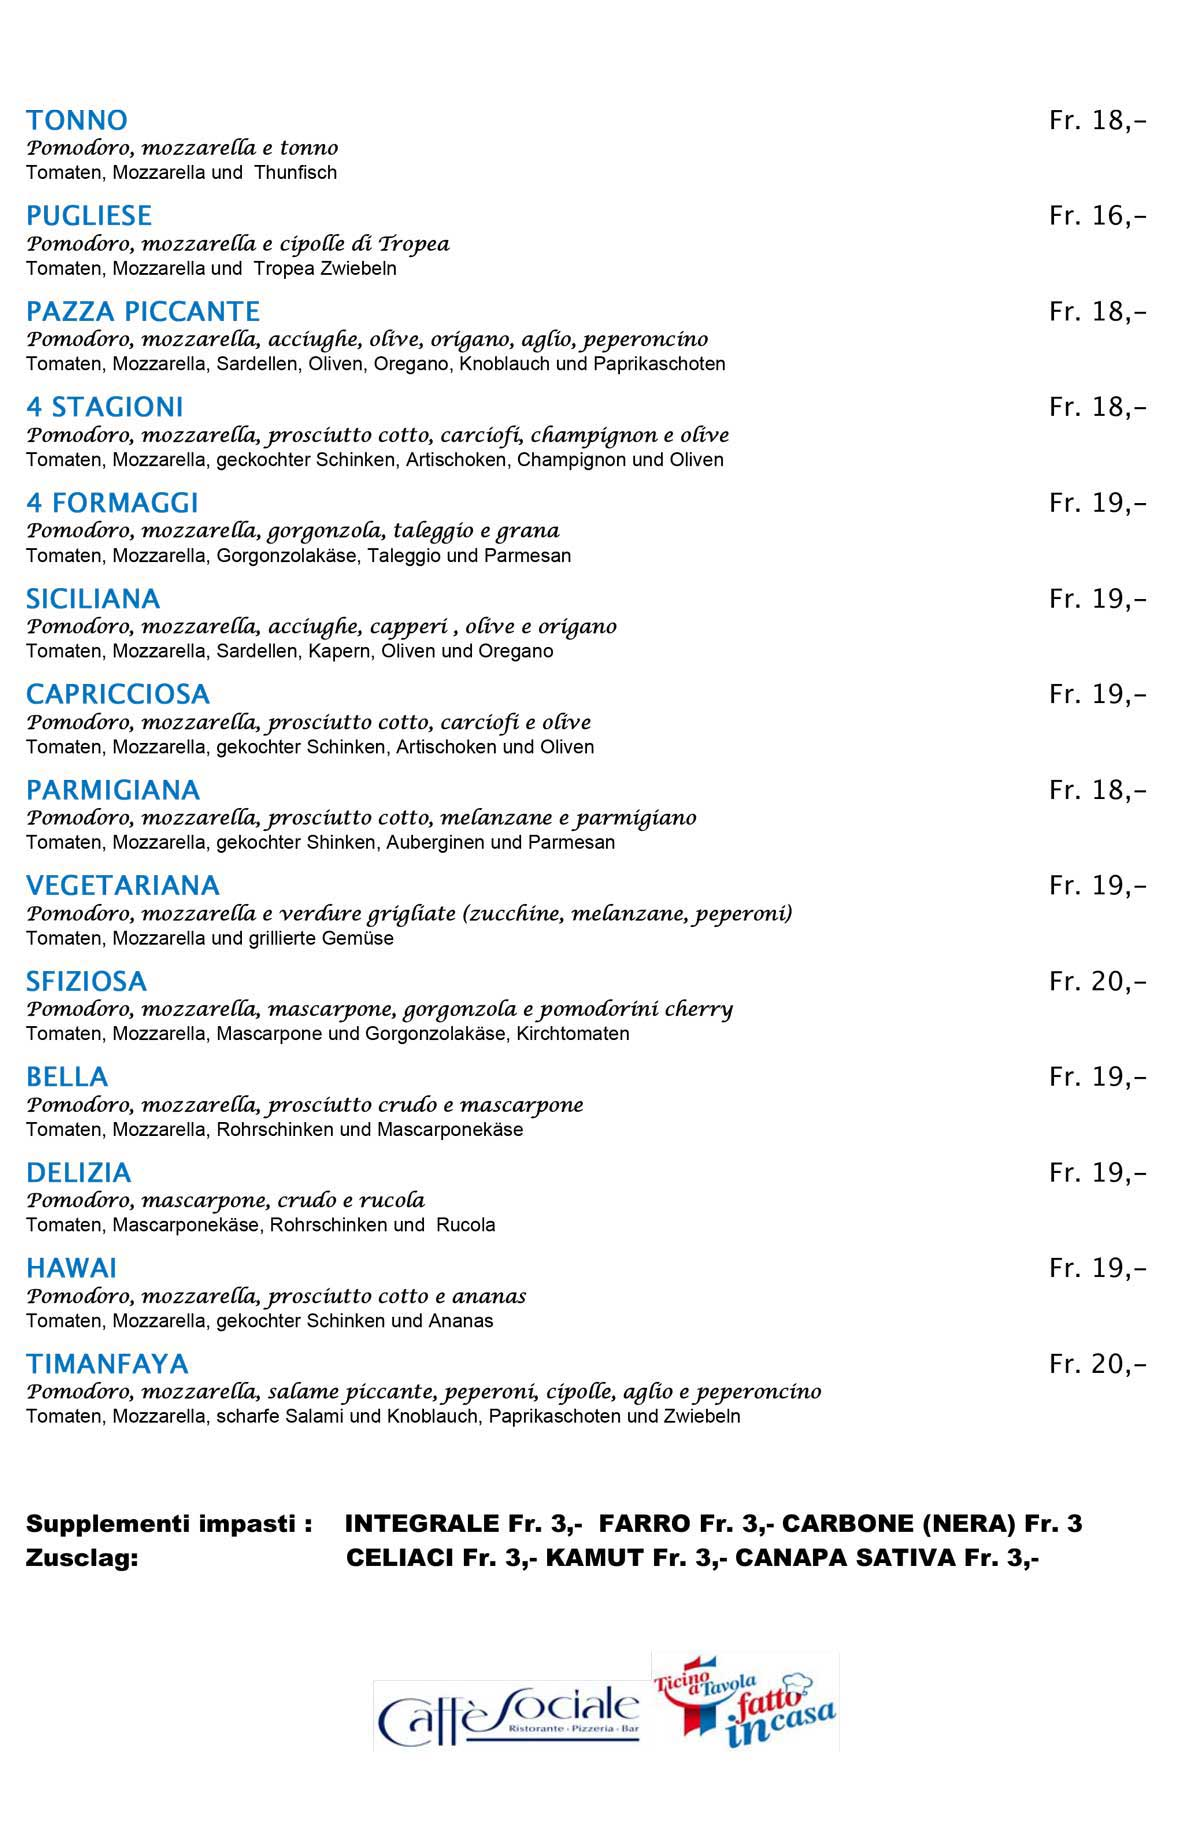 Ristorante Sociale Riva san Vitale menu pizze pag 2